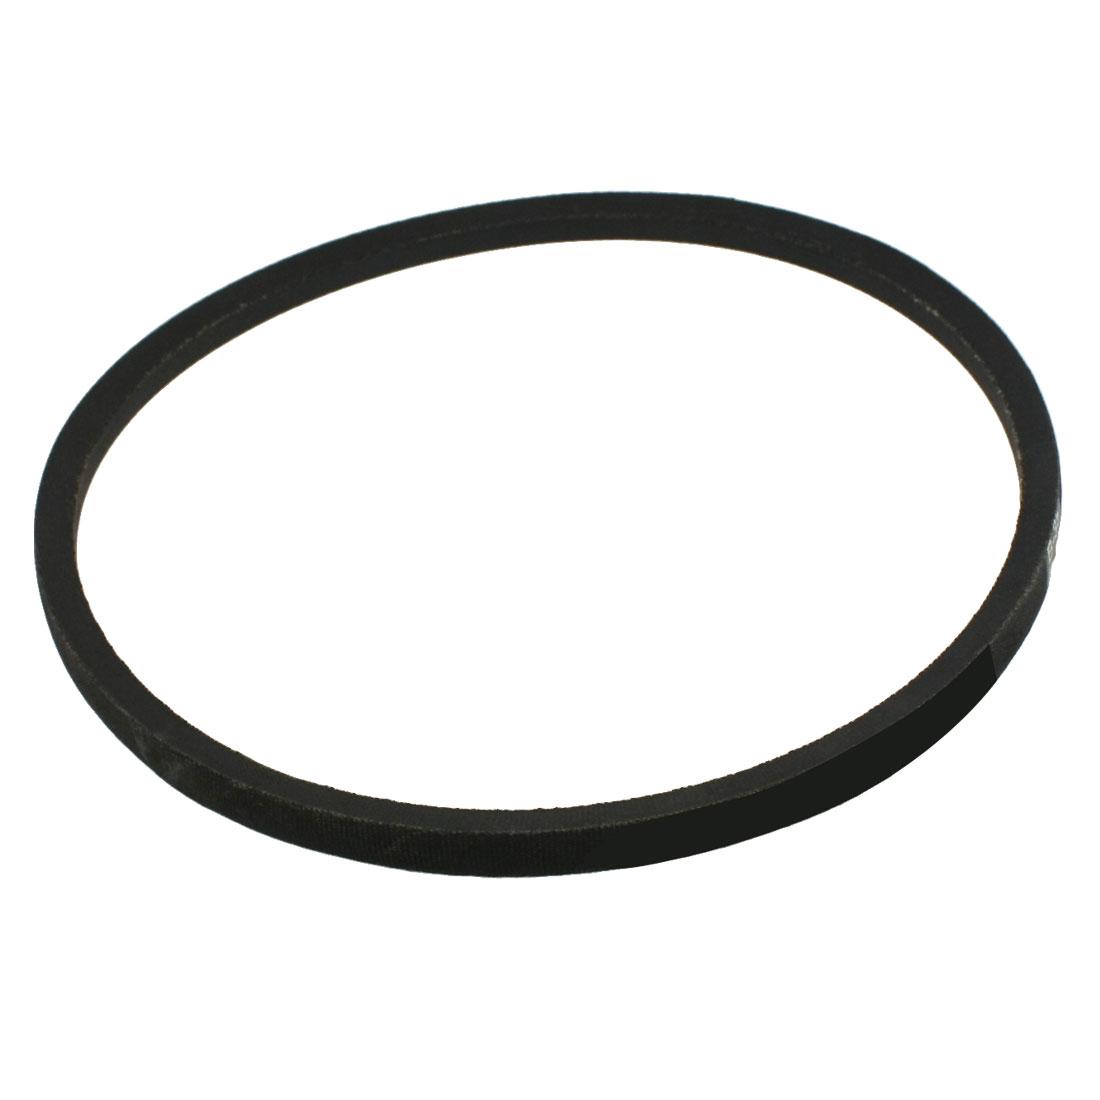 "Machinery Drive Band Black Rubber Belts B Type Vee Belt 16mm x 35"""